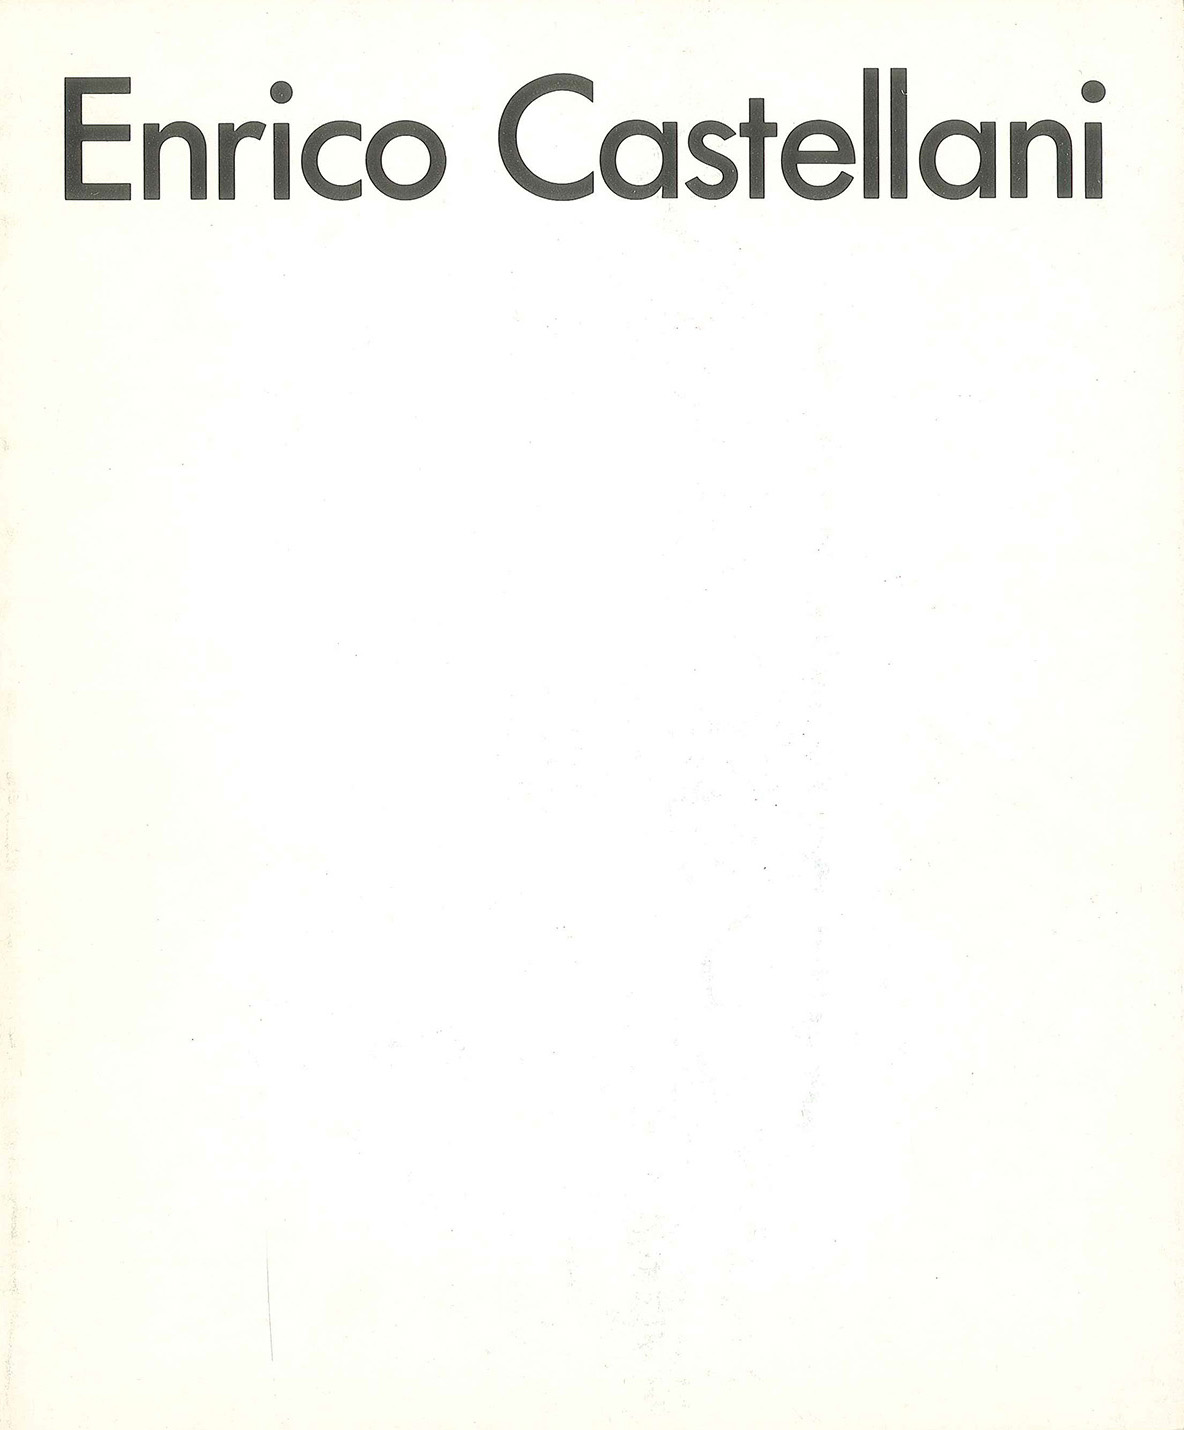 Cover - Enrico Castellani, Adachiara Zevi, 1987, Albert Totah Gallery, New York (NY, USA), Edward Totah Gallery, Londra (GBR)